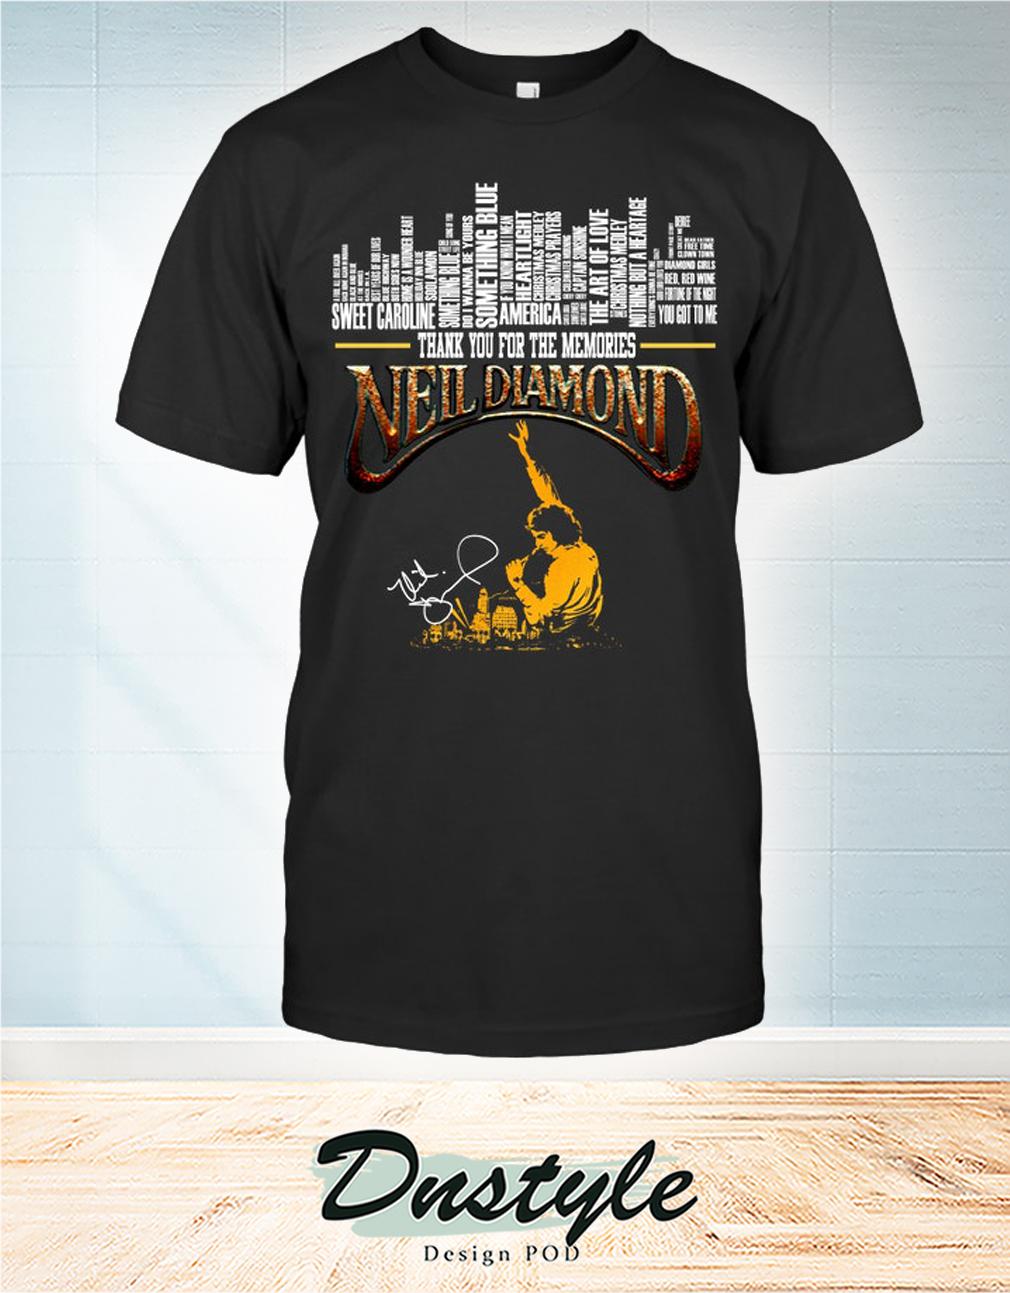 Thank you for the memories Neil Diamond signature shirt